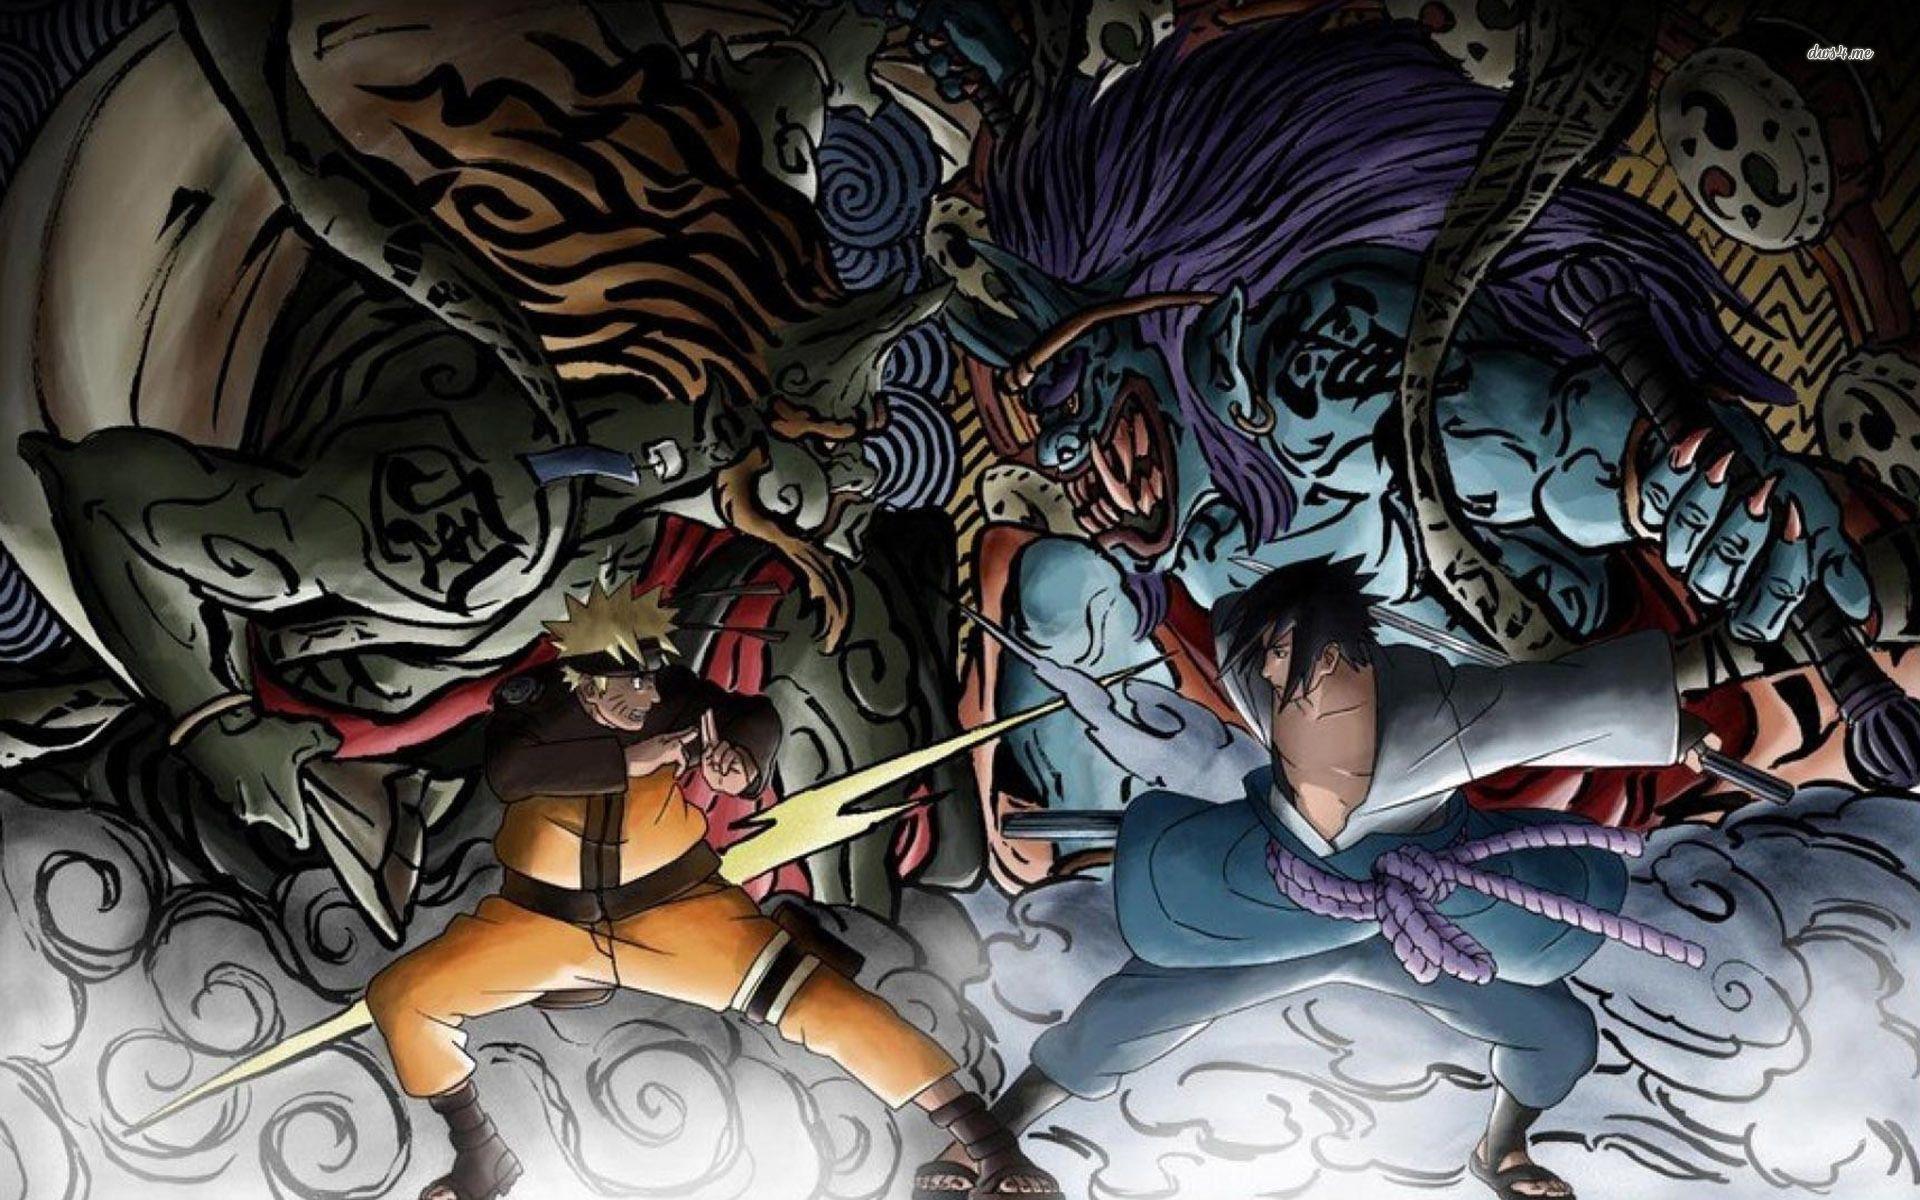 Anime Naruto Shippuden Wallpapers Top Free Anime Naruto